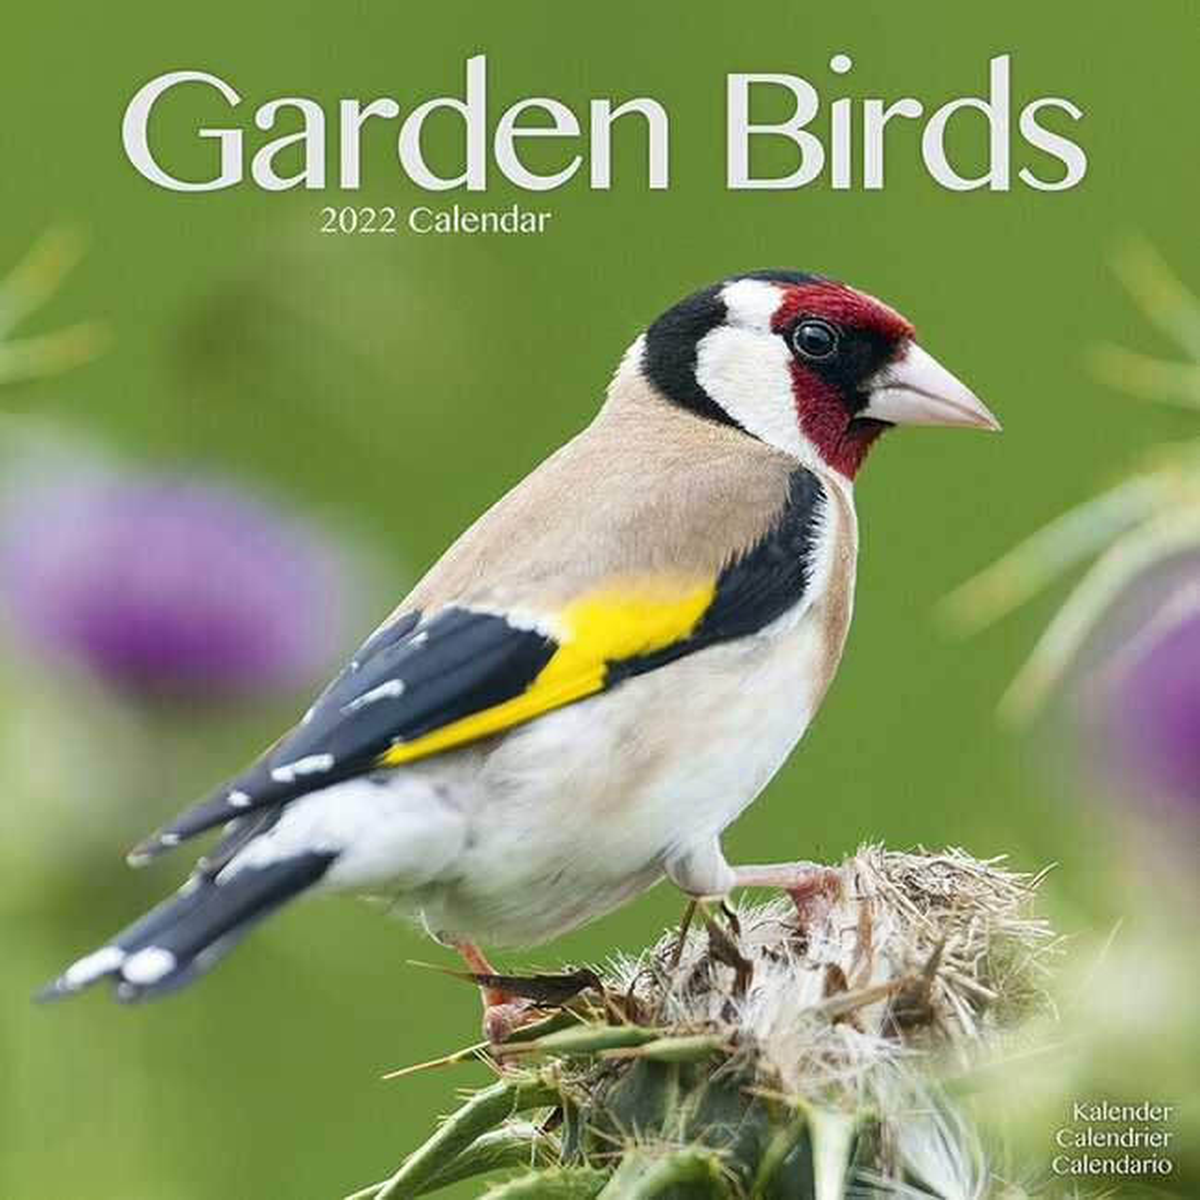 Calendrier Jardin 2022 Calendrier 2022 Oiseaux du jardin